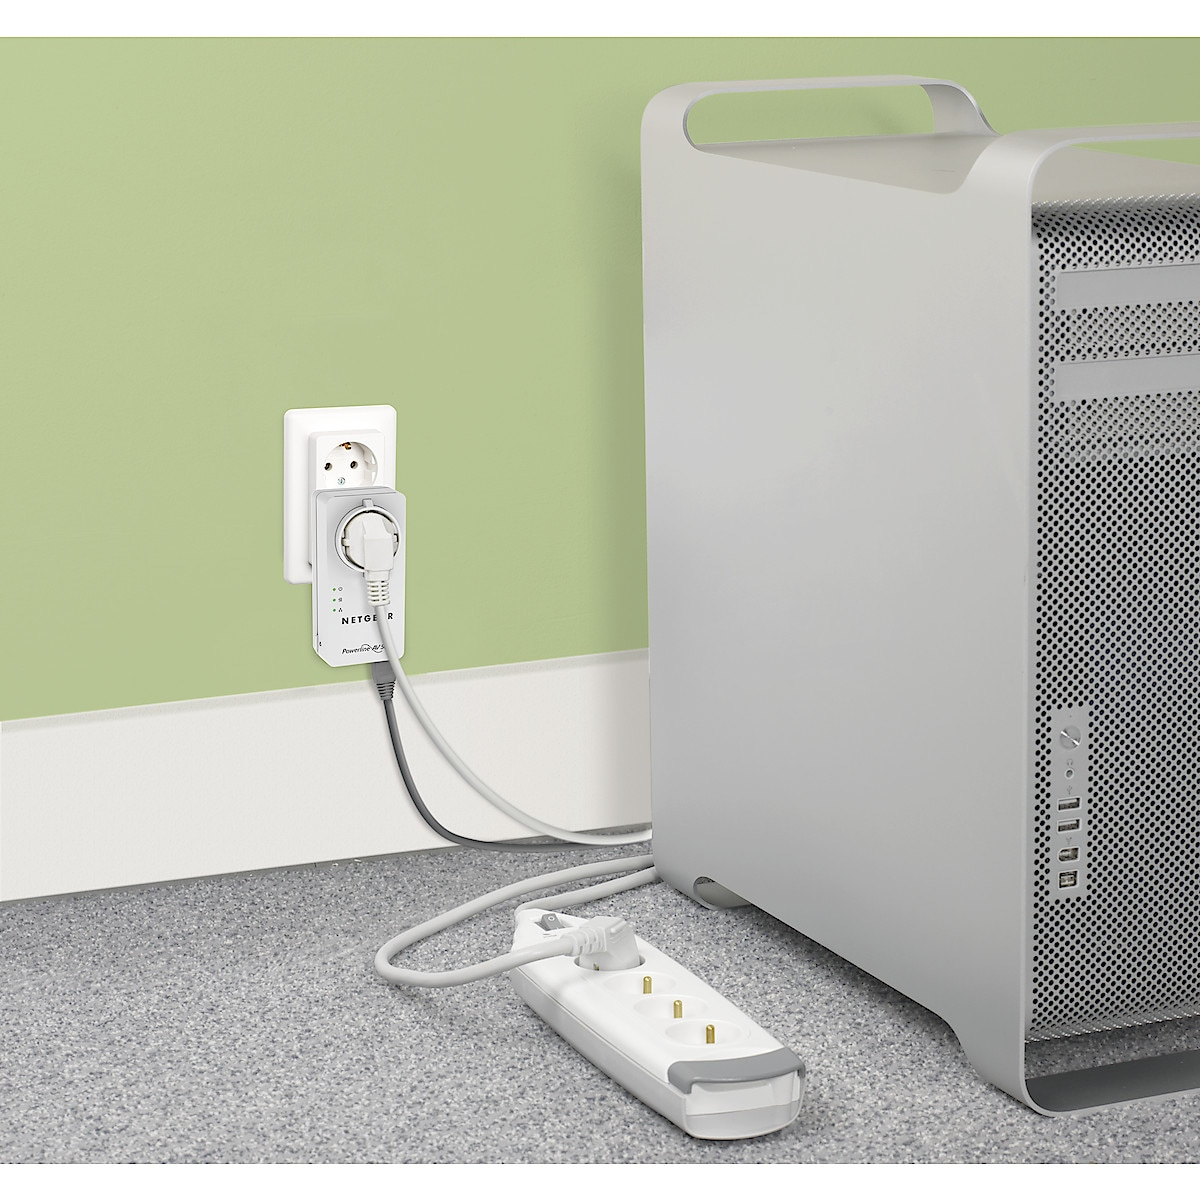 HomePlug Netgear XAVB5401